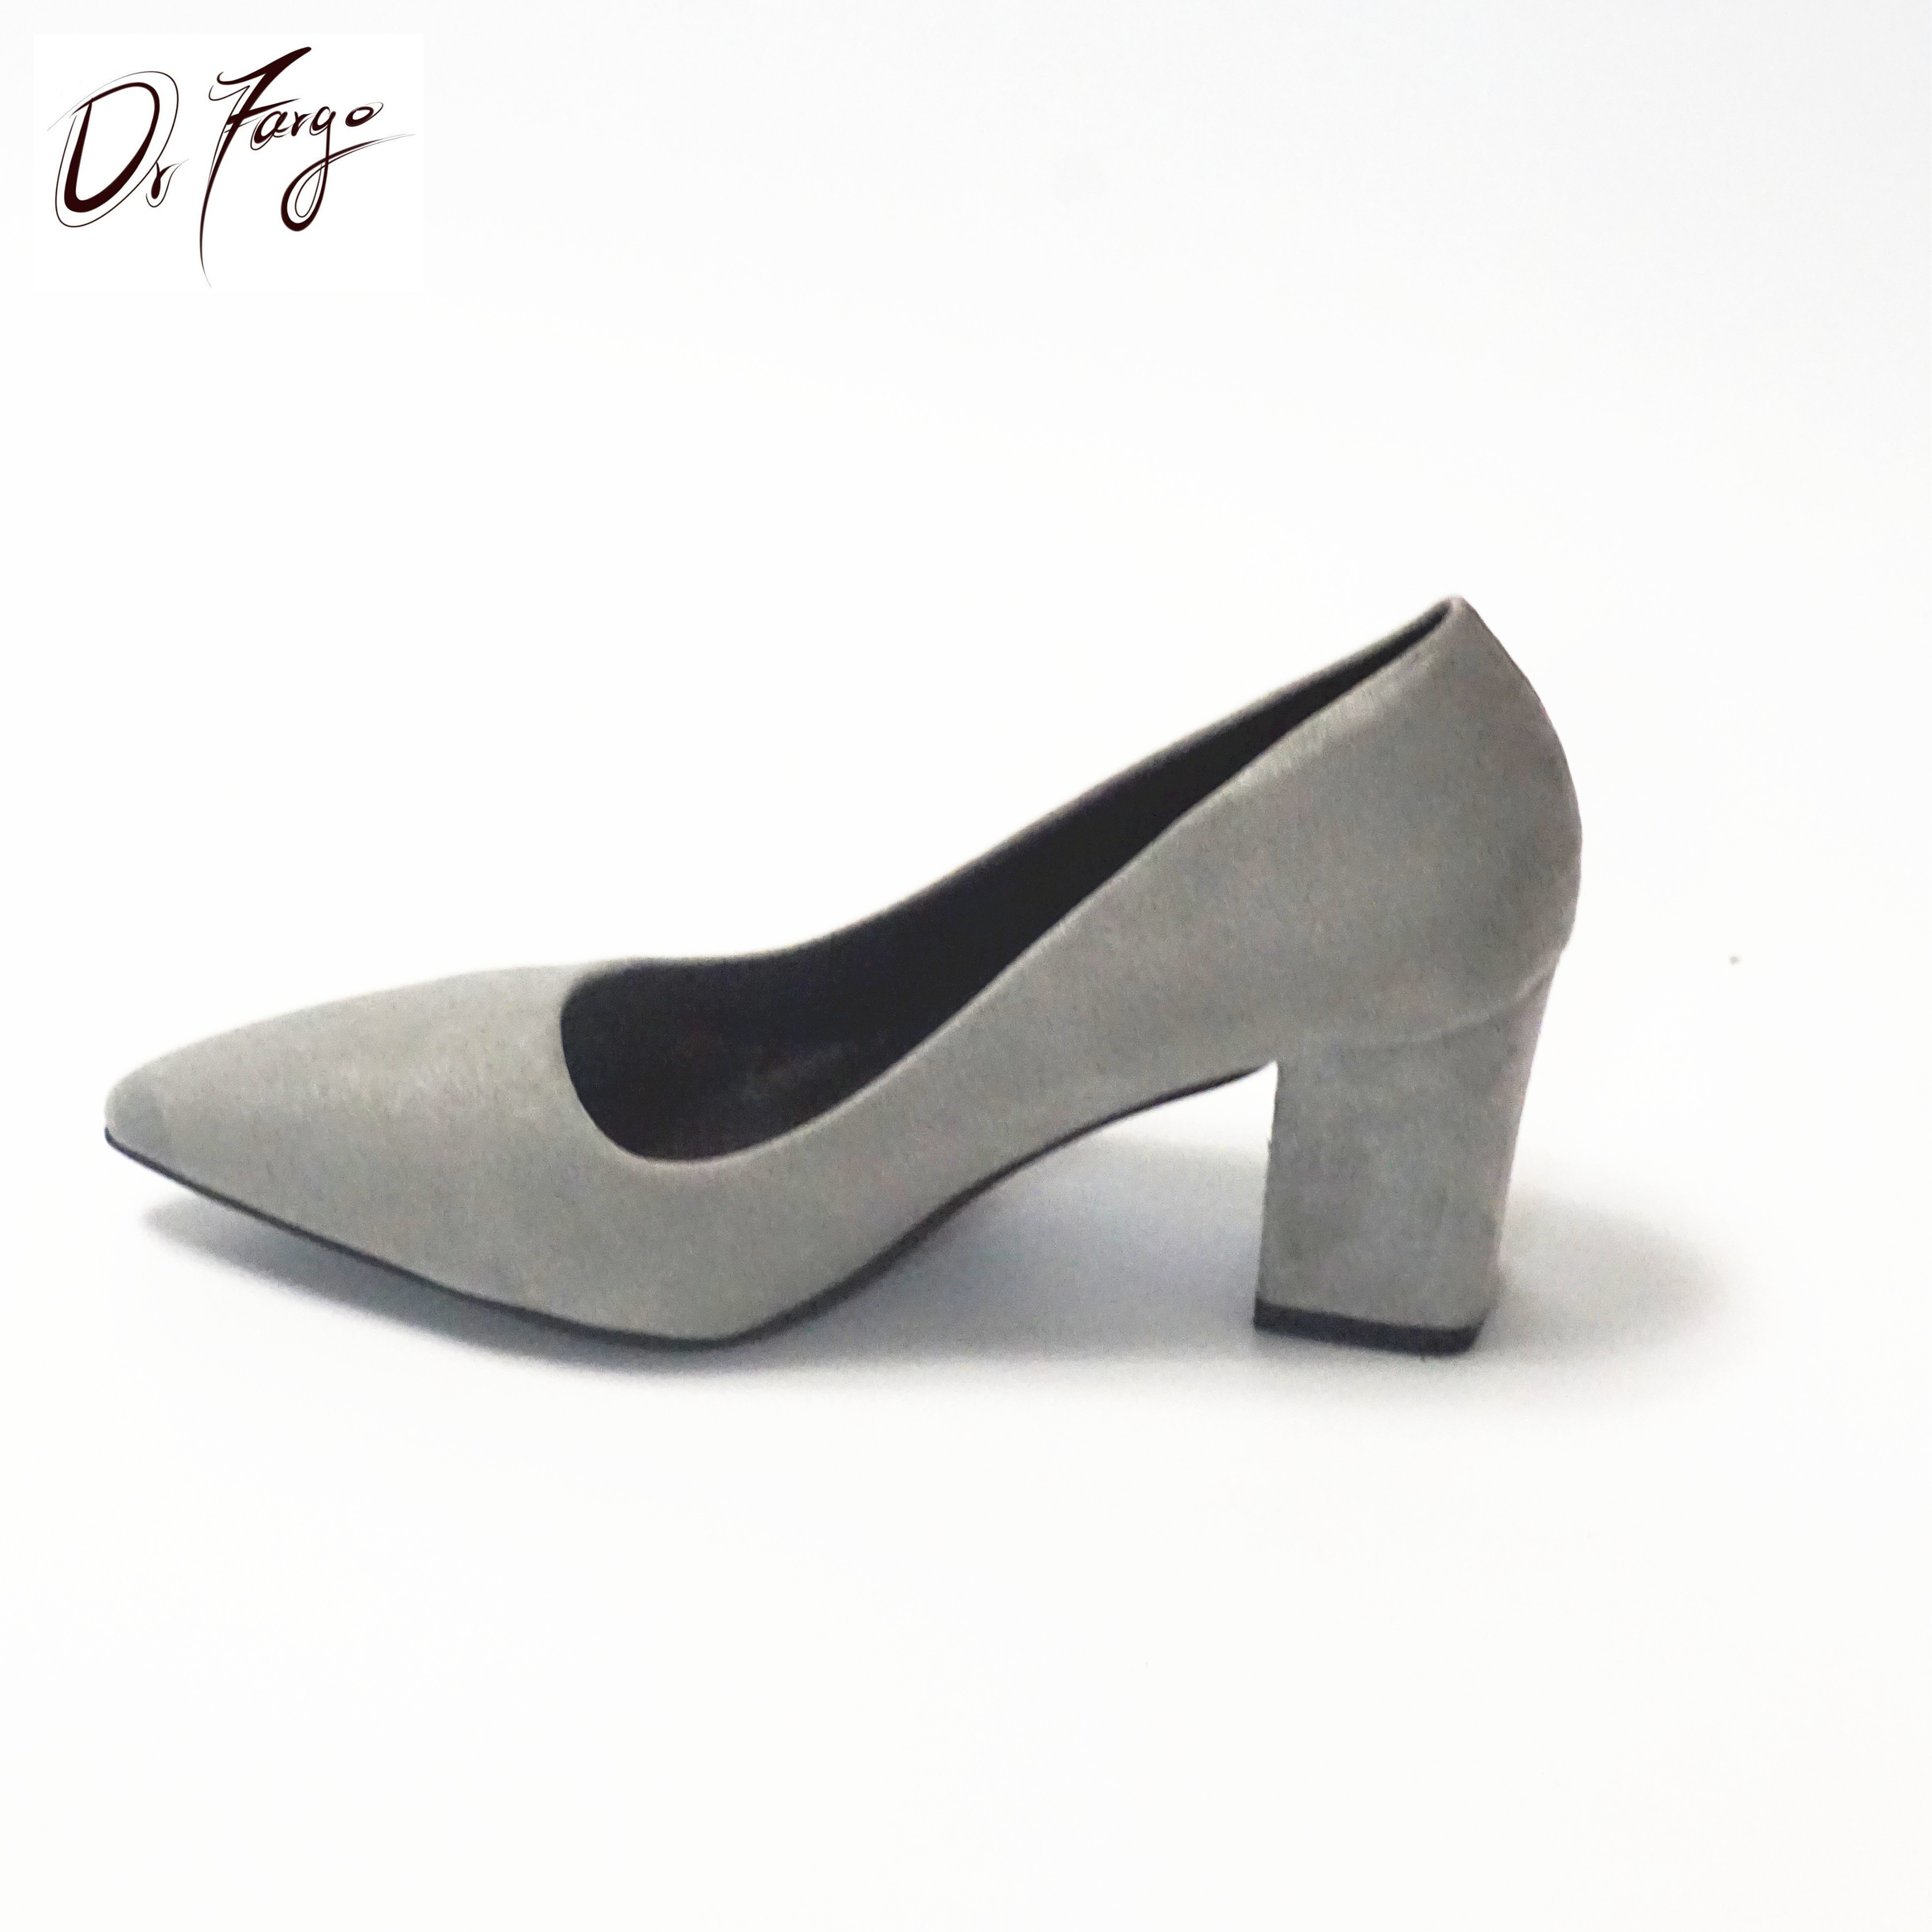 56a91c6dc4f3 ... DRFARGO Women s 7.5 cm Block Heel Sexy Pointed Toe Woman Pumps Summer  Spring EUR 34 ...